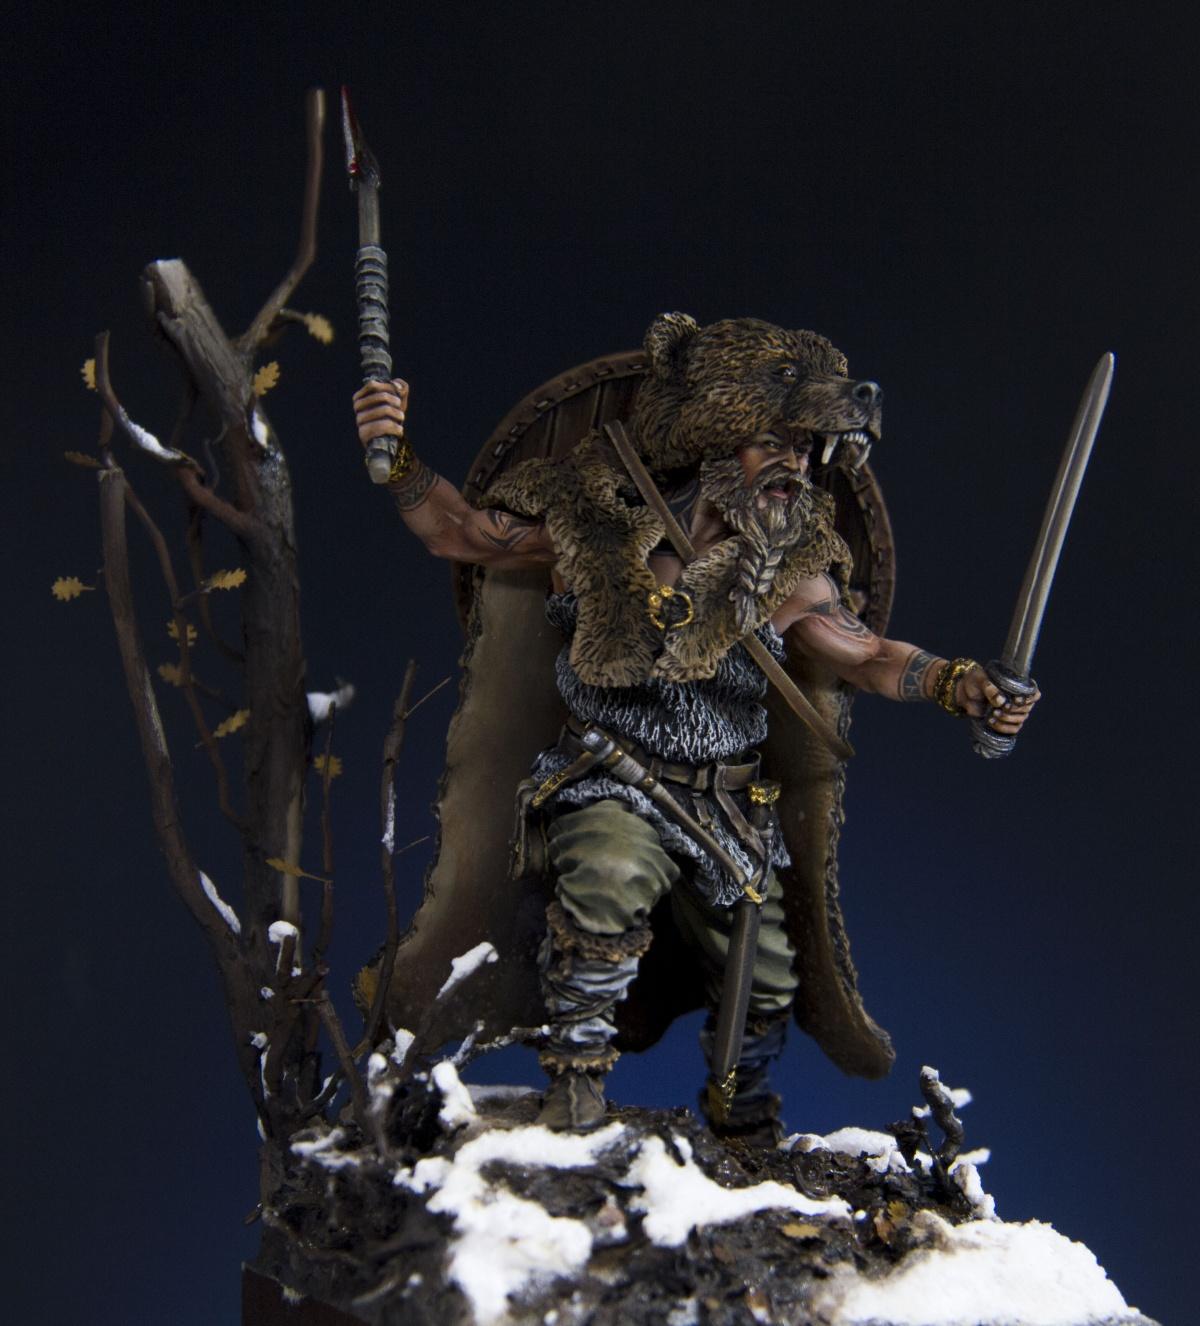 Viking-Berserker by Aleksandr_Bodrikov · Putty&Paint  Viking Berserker